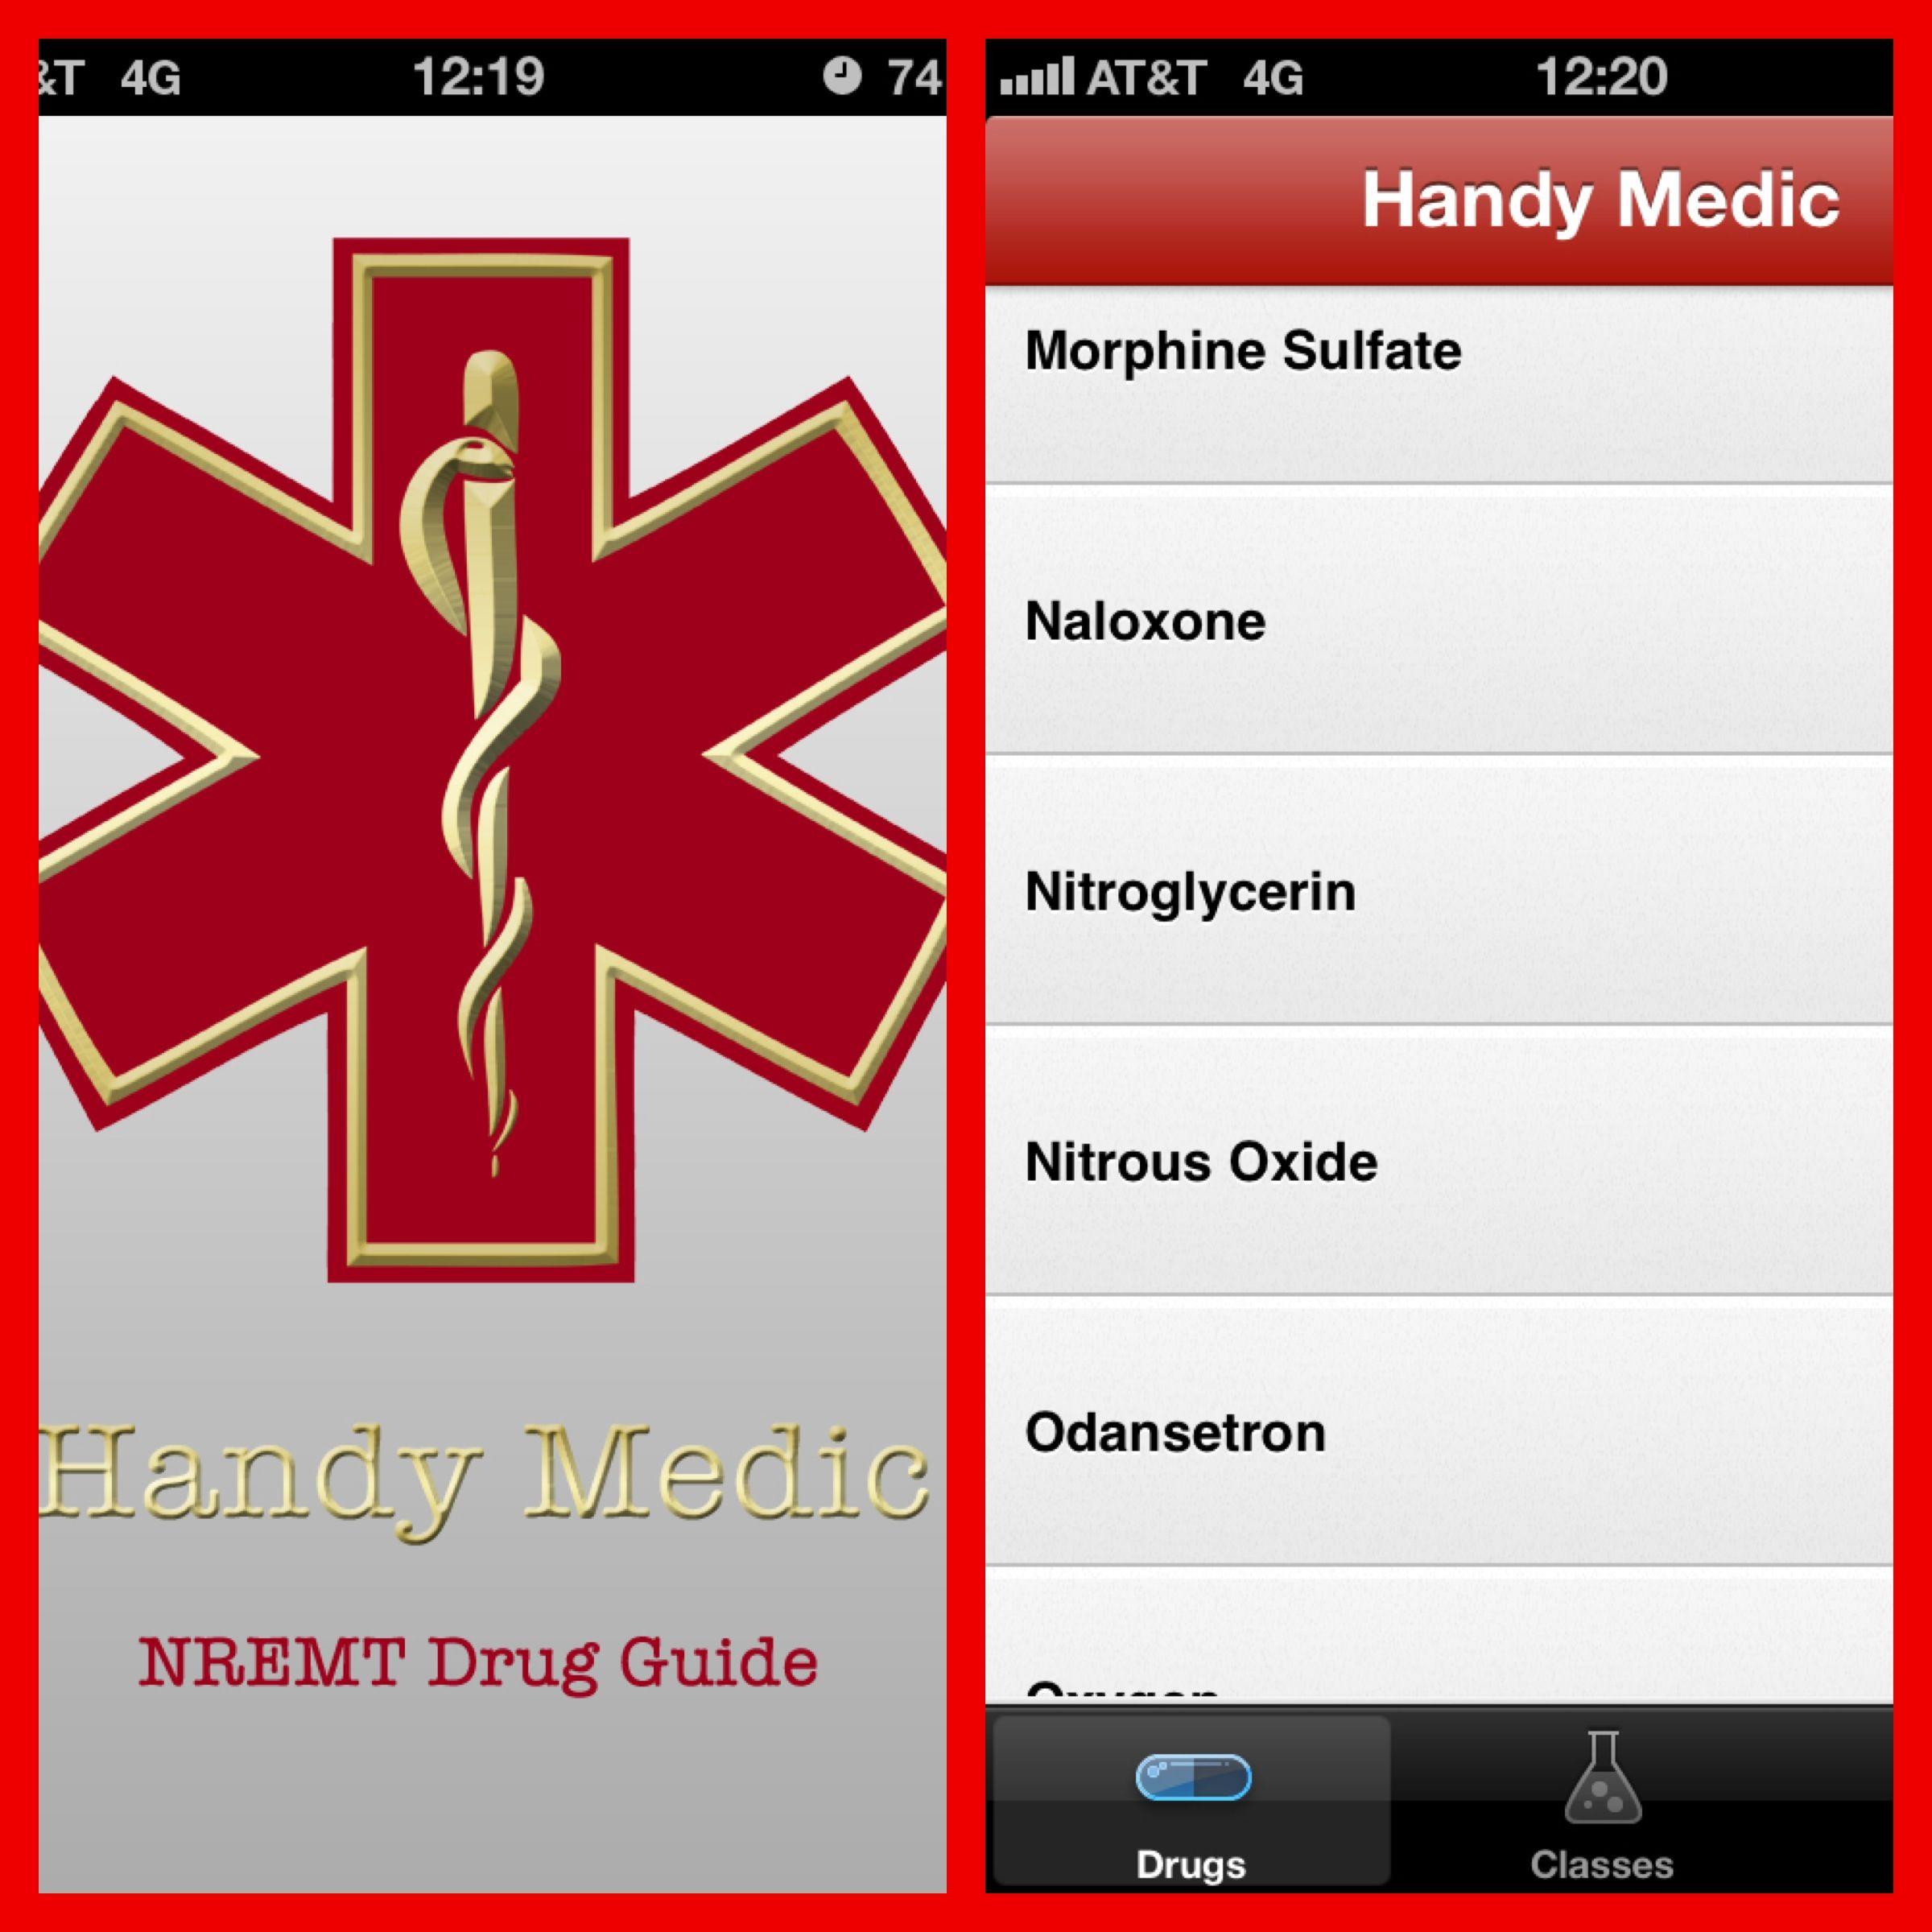 #emt #paramedic great way to learn drugs for anyone going through the program. Emt #medicalprestonnalex